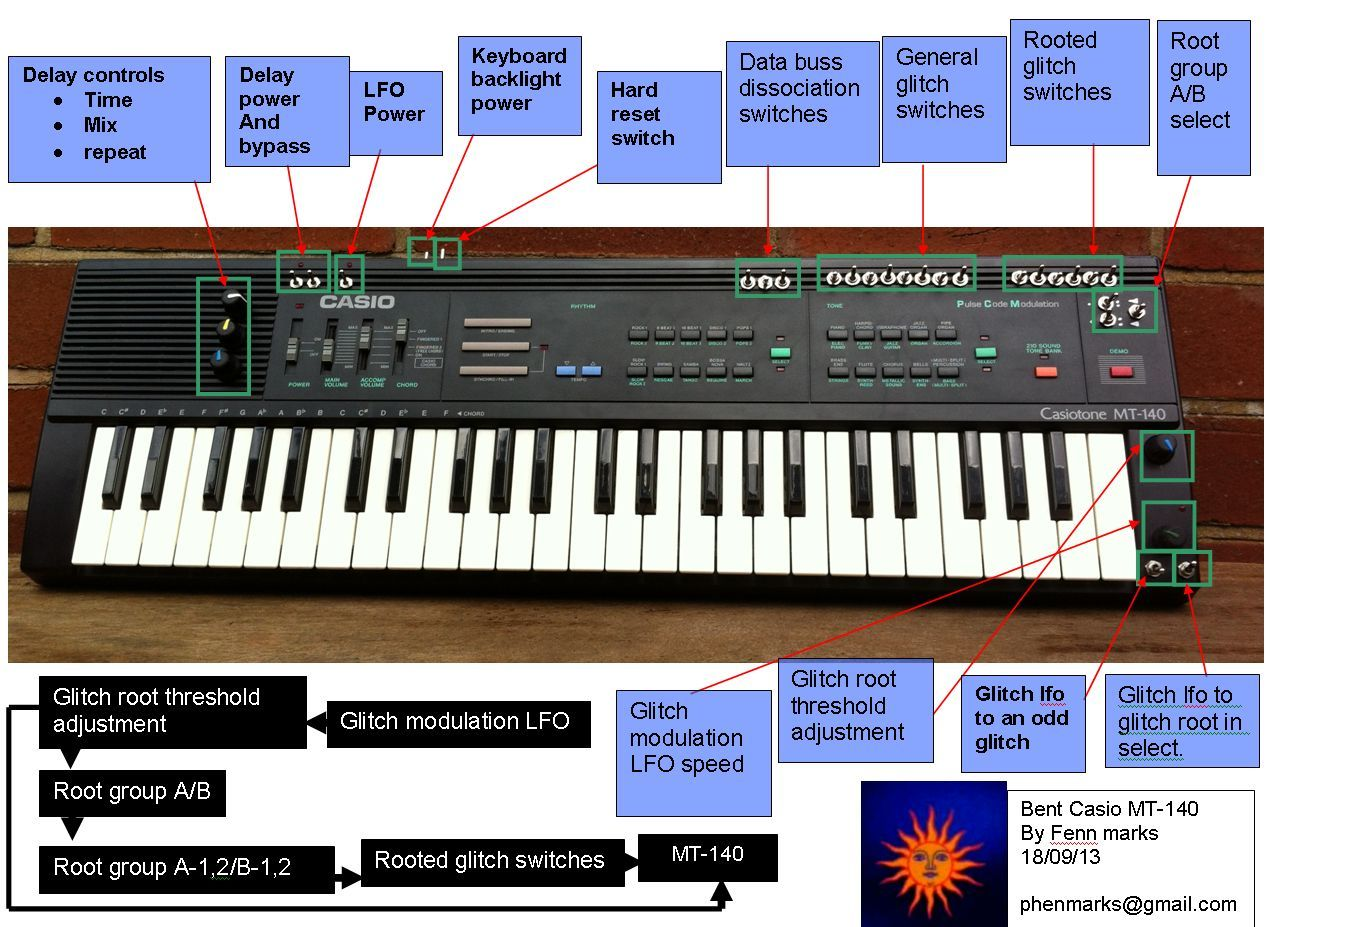 Circuit Bent Casio Keyboard Diabolical Devices Sk1 Sampling Fun Blue Back Light Demo For Ebay 1350x927